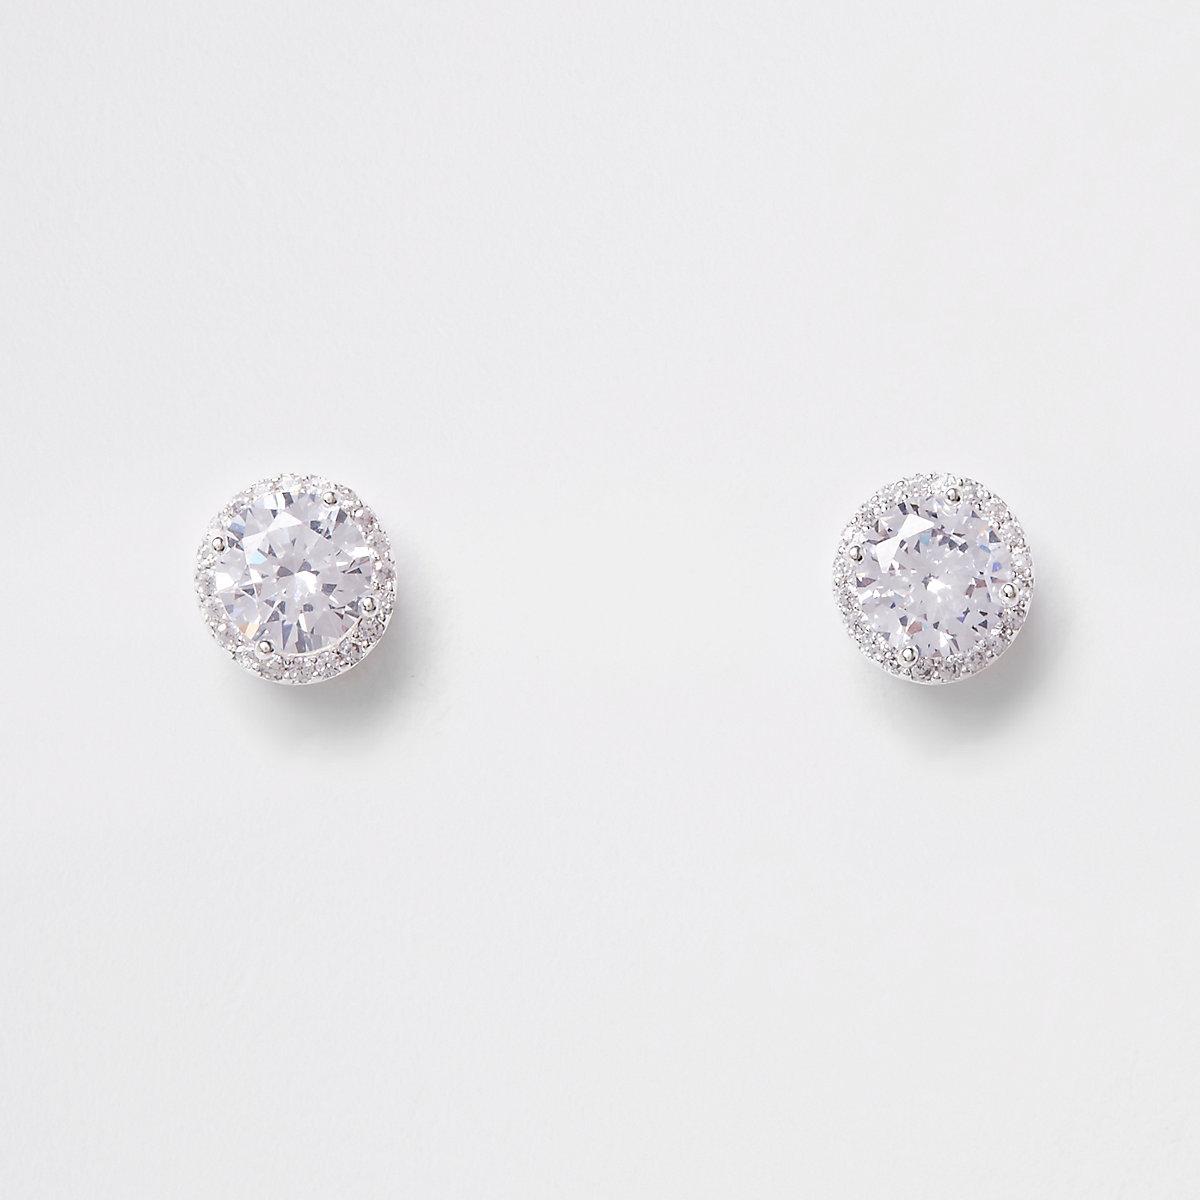 Silver plated cubic zirconia rhinestone earring